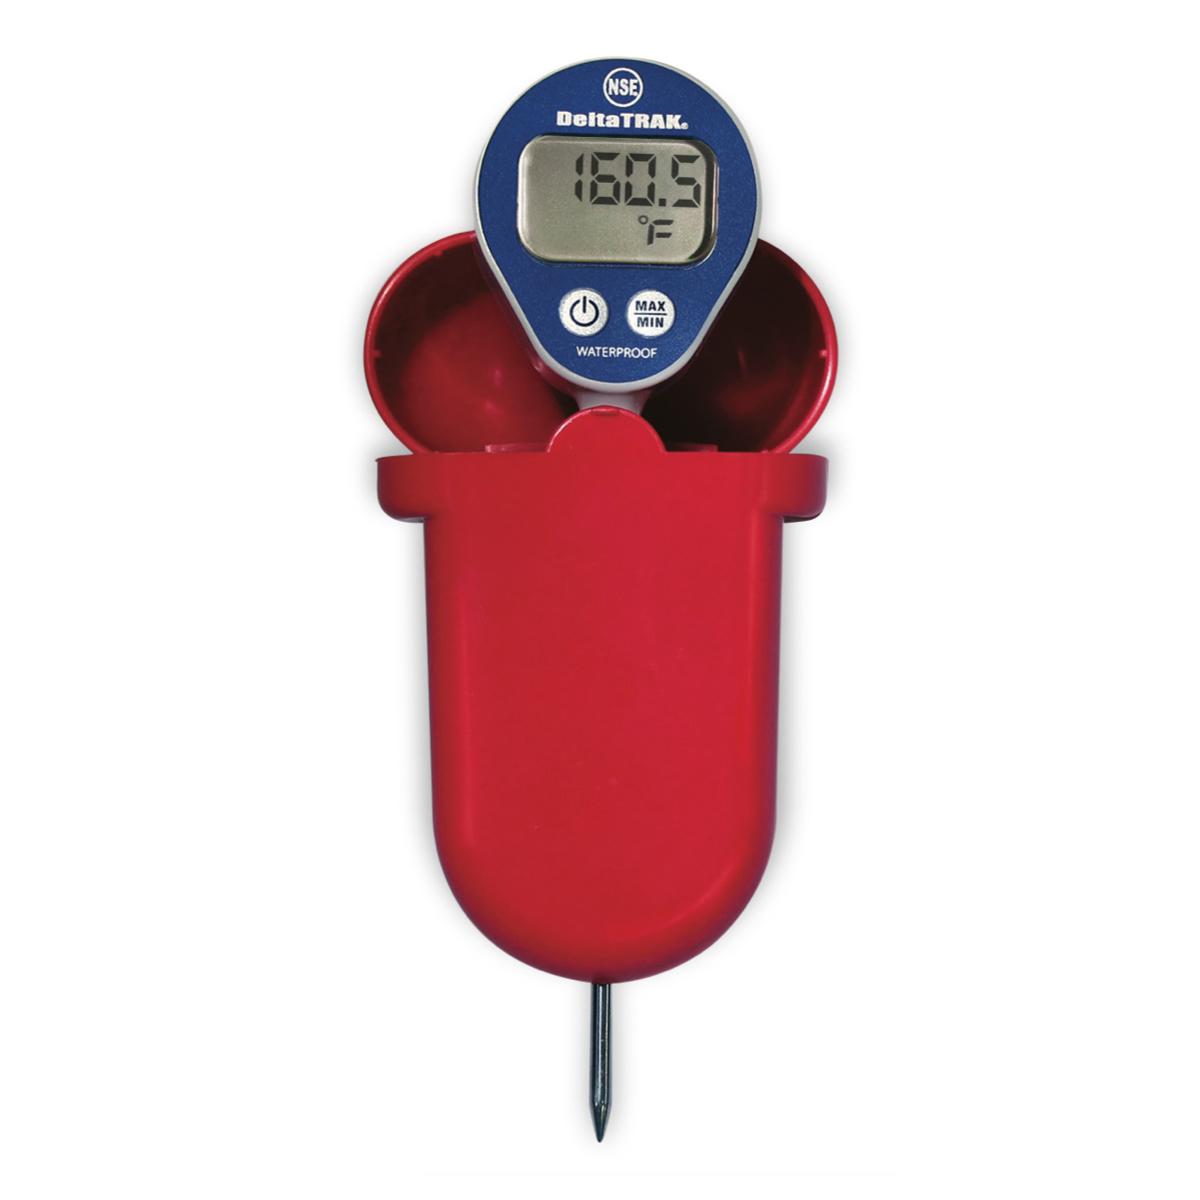 DeltaTrak Malaysia 12214 | FlashCheck® Waterproof Dishwasher Thermometer Kit -40°F~311°F/-40°C~155°C